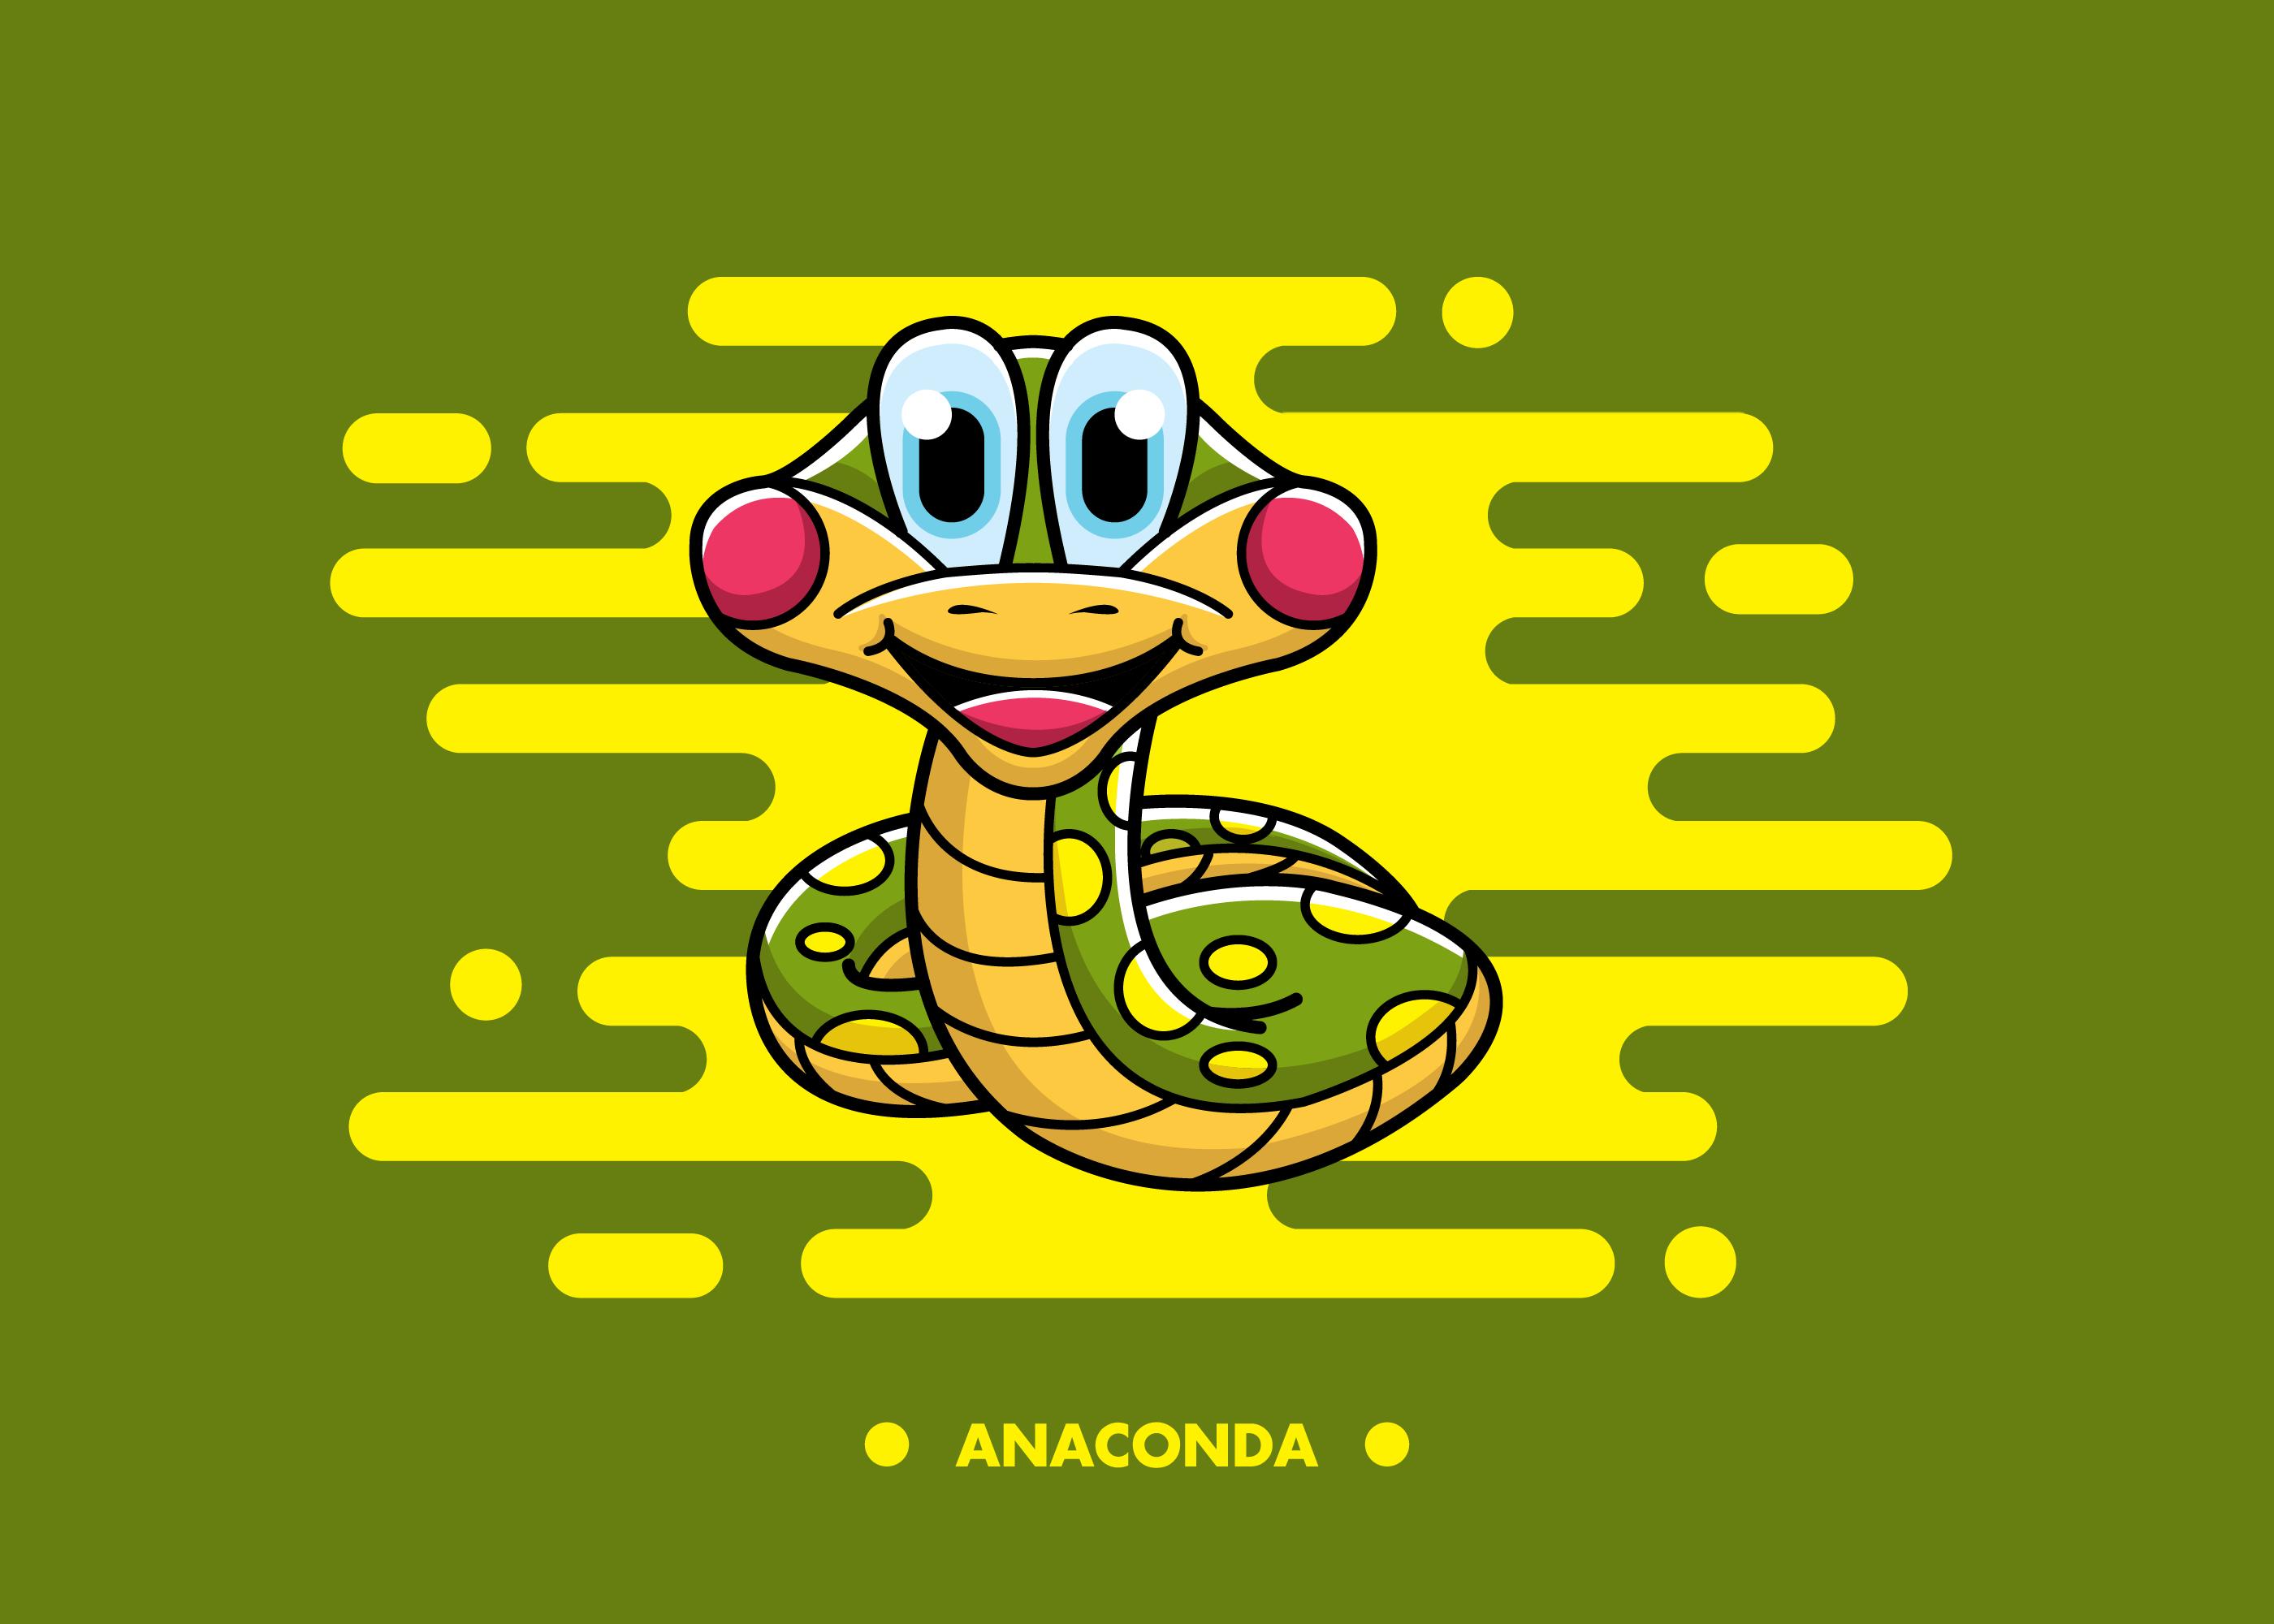 Anaconda (comics) - Wikipedia